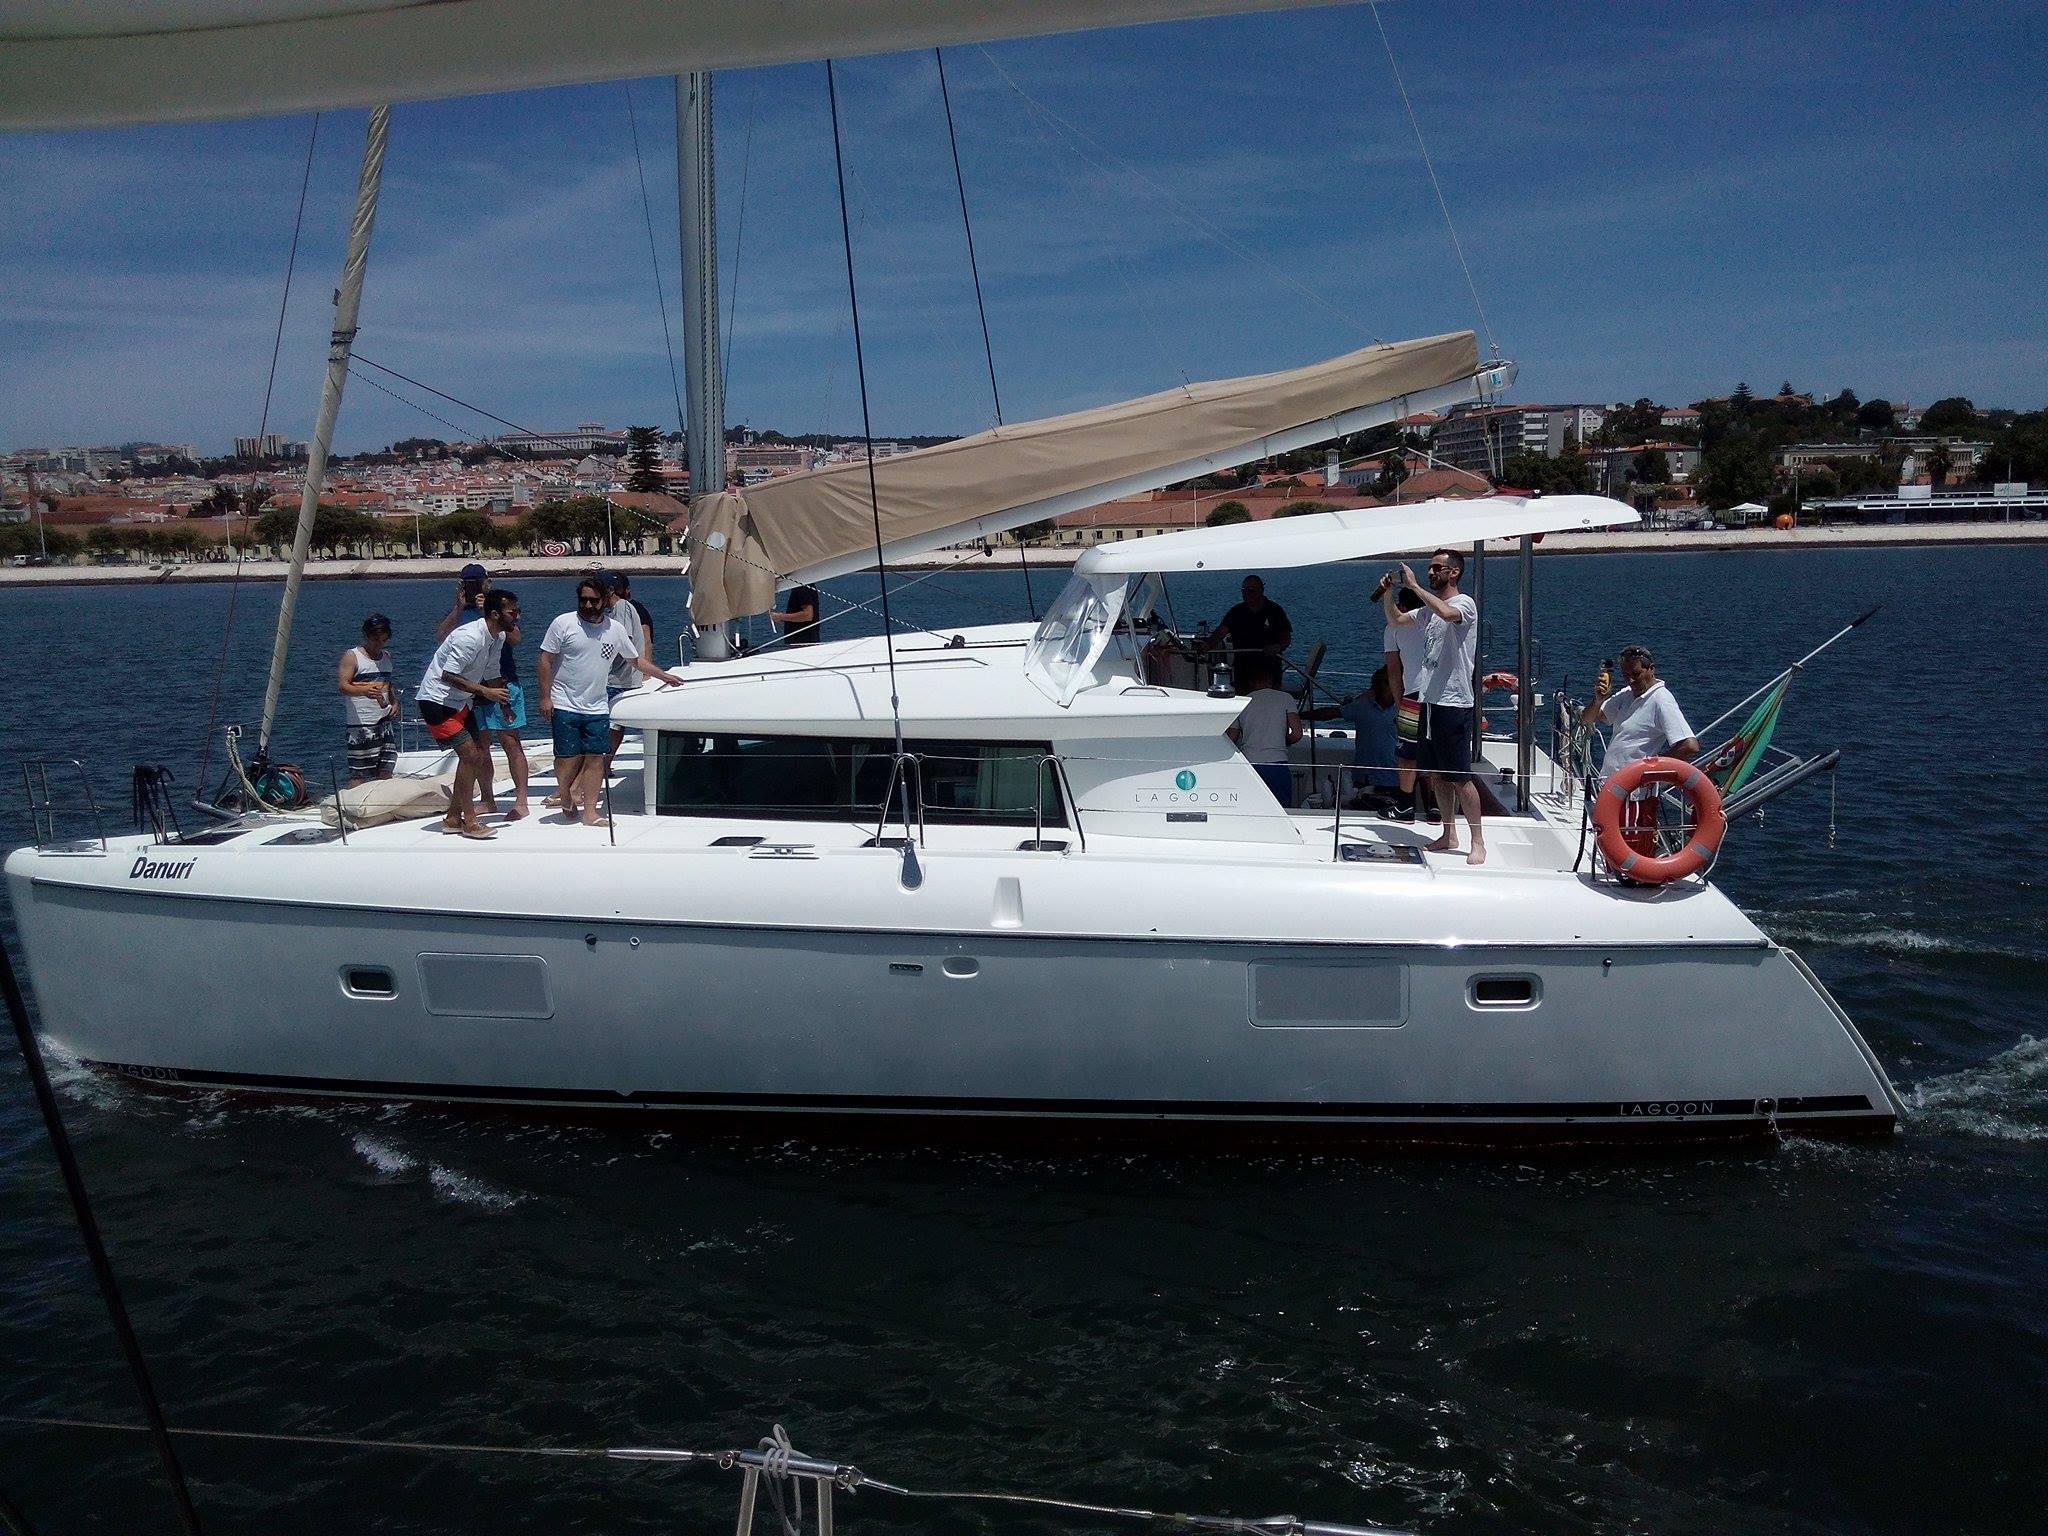 Catamaran 14 mts